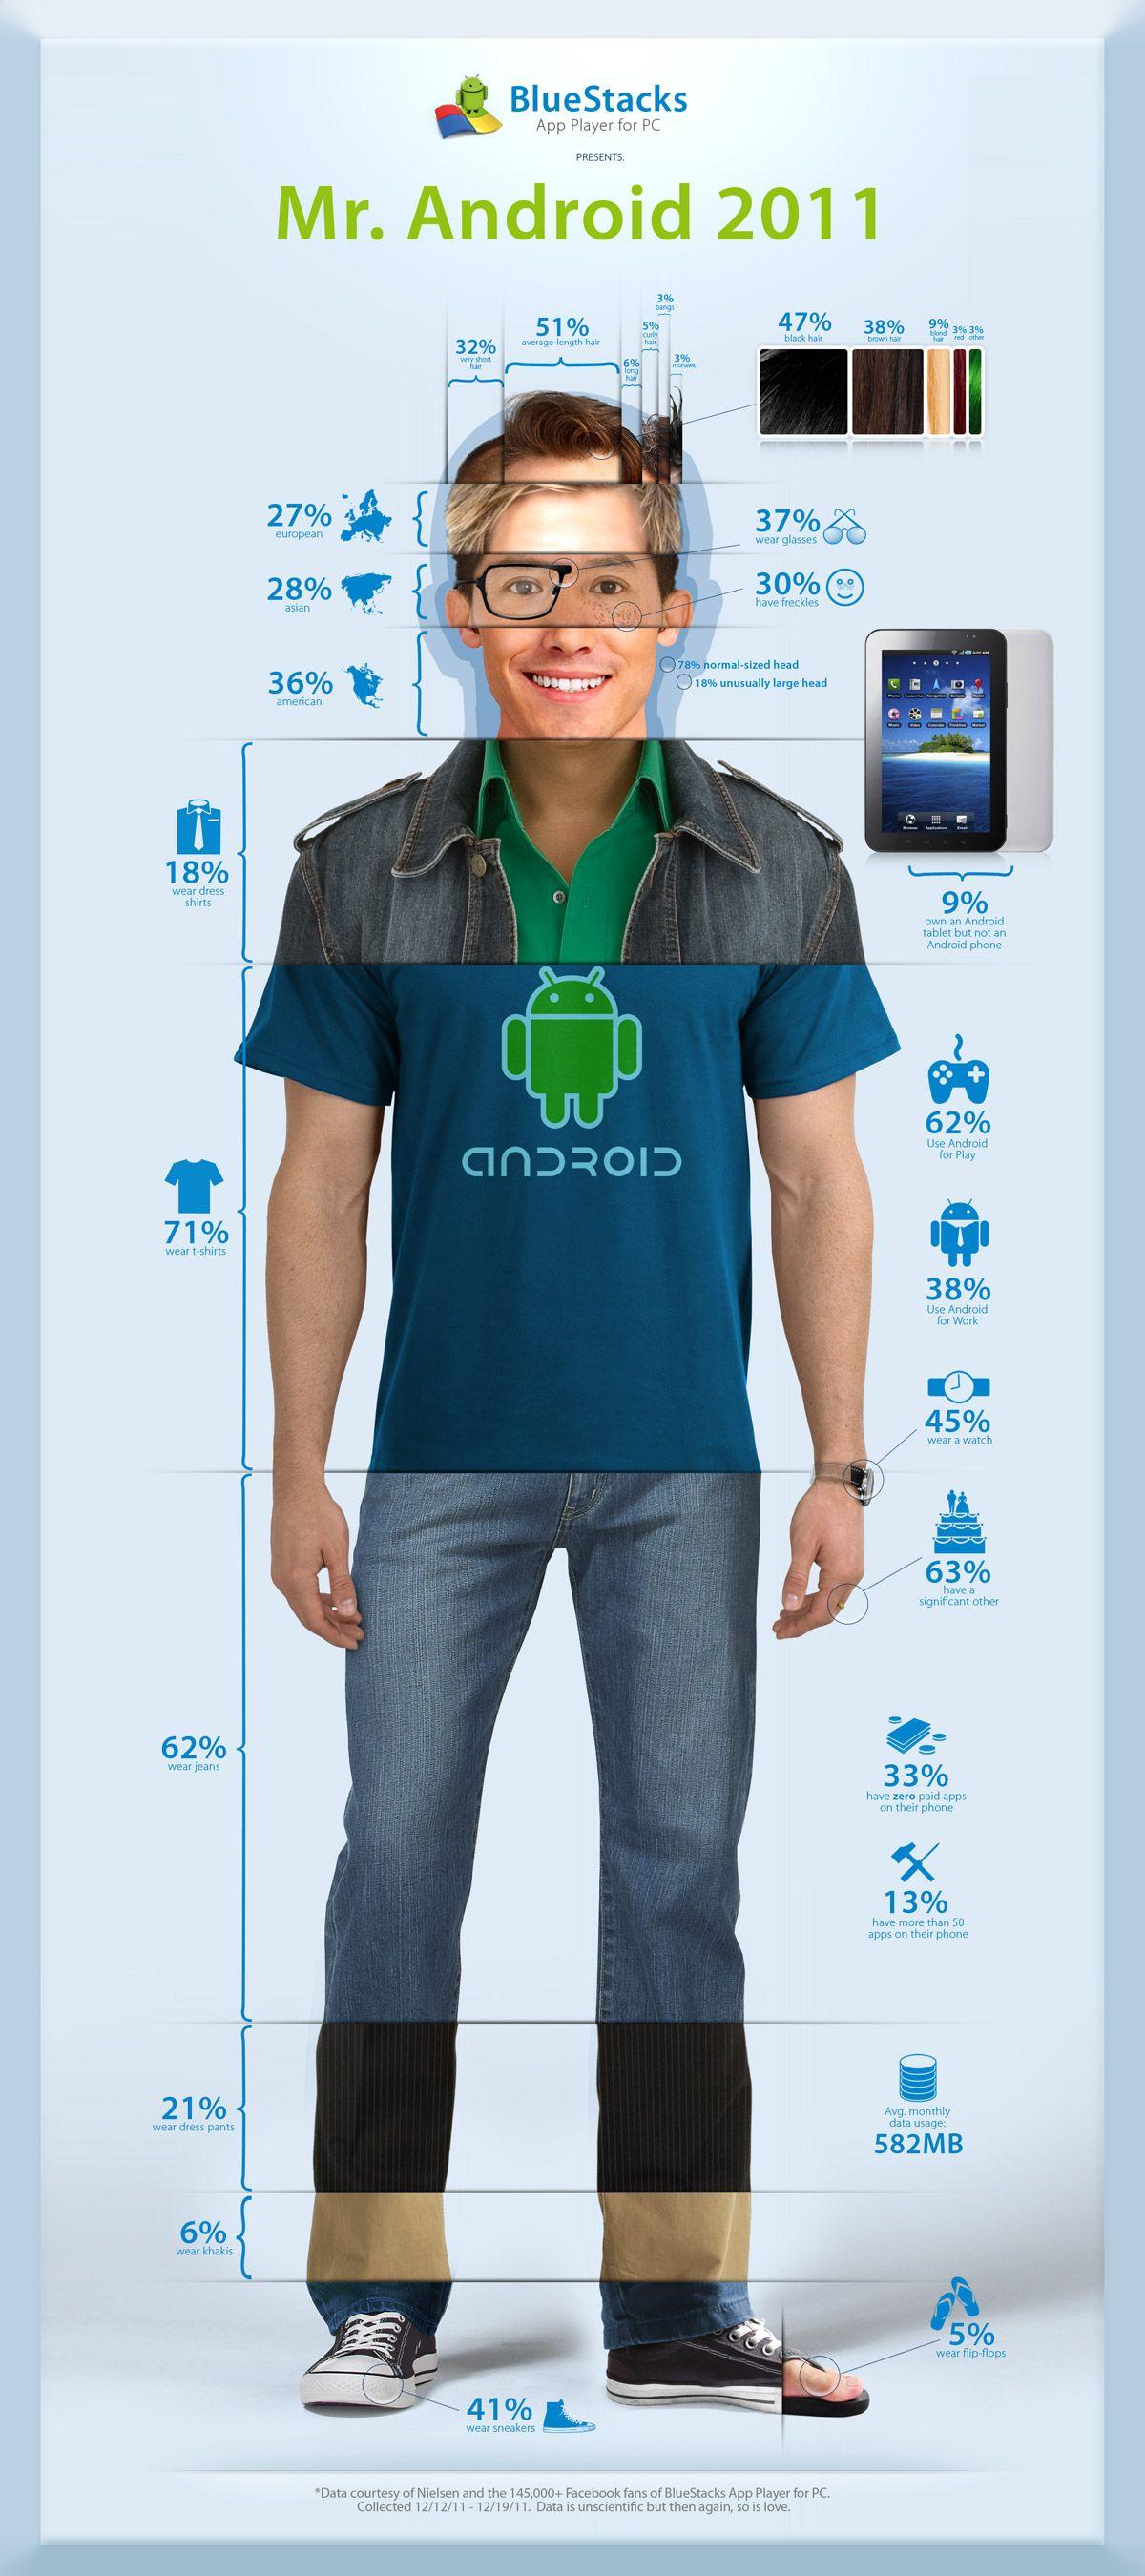 Senhor Android